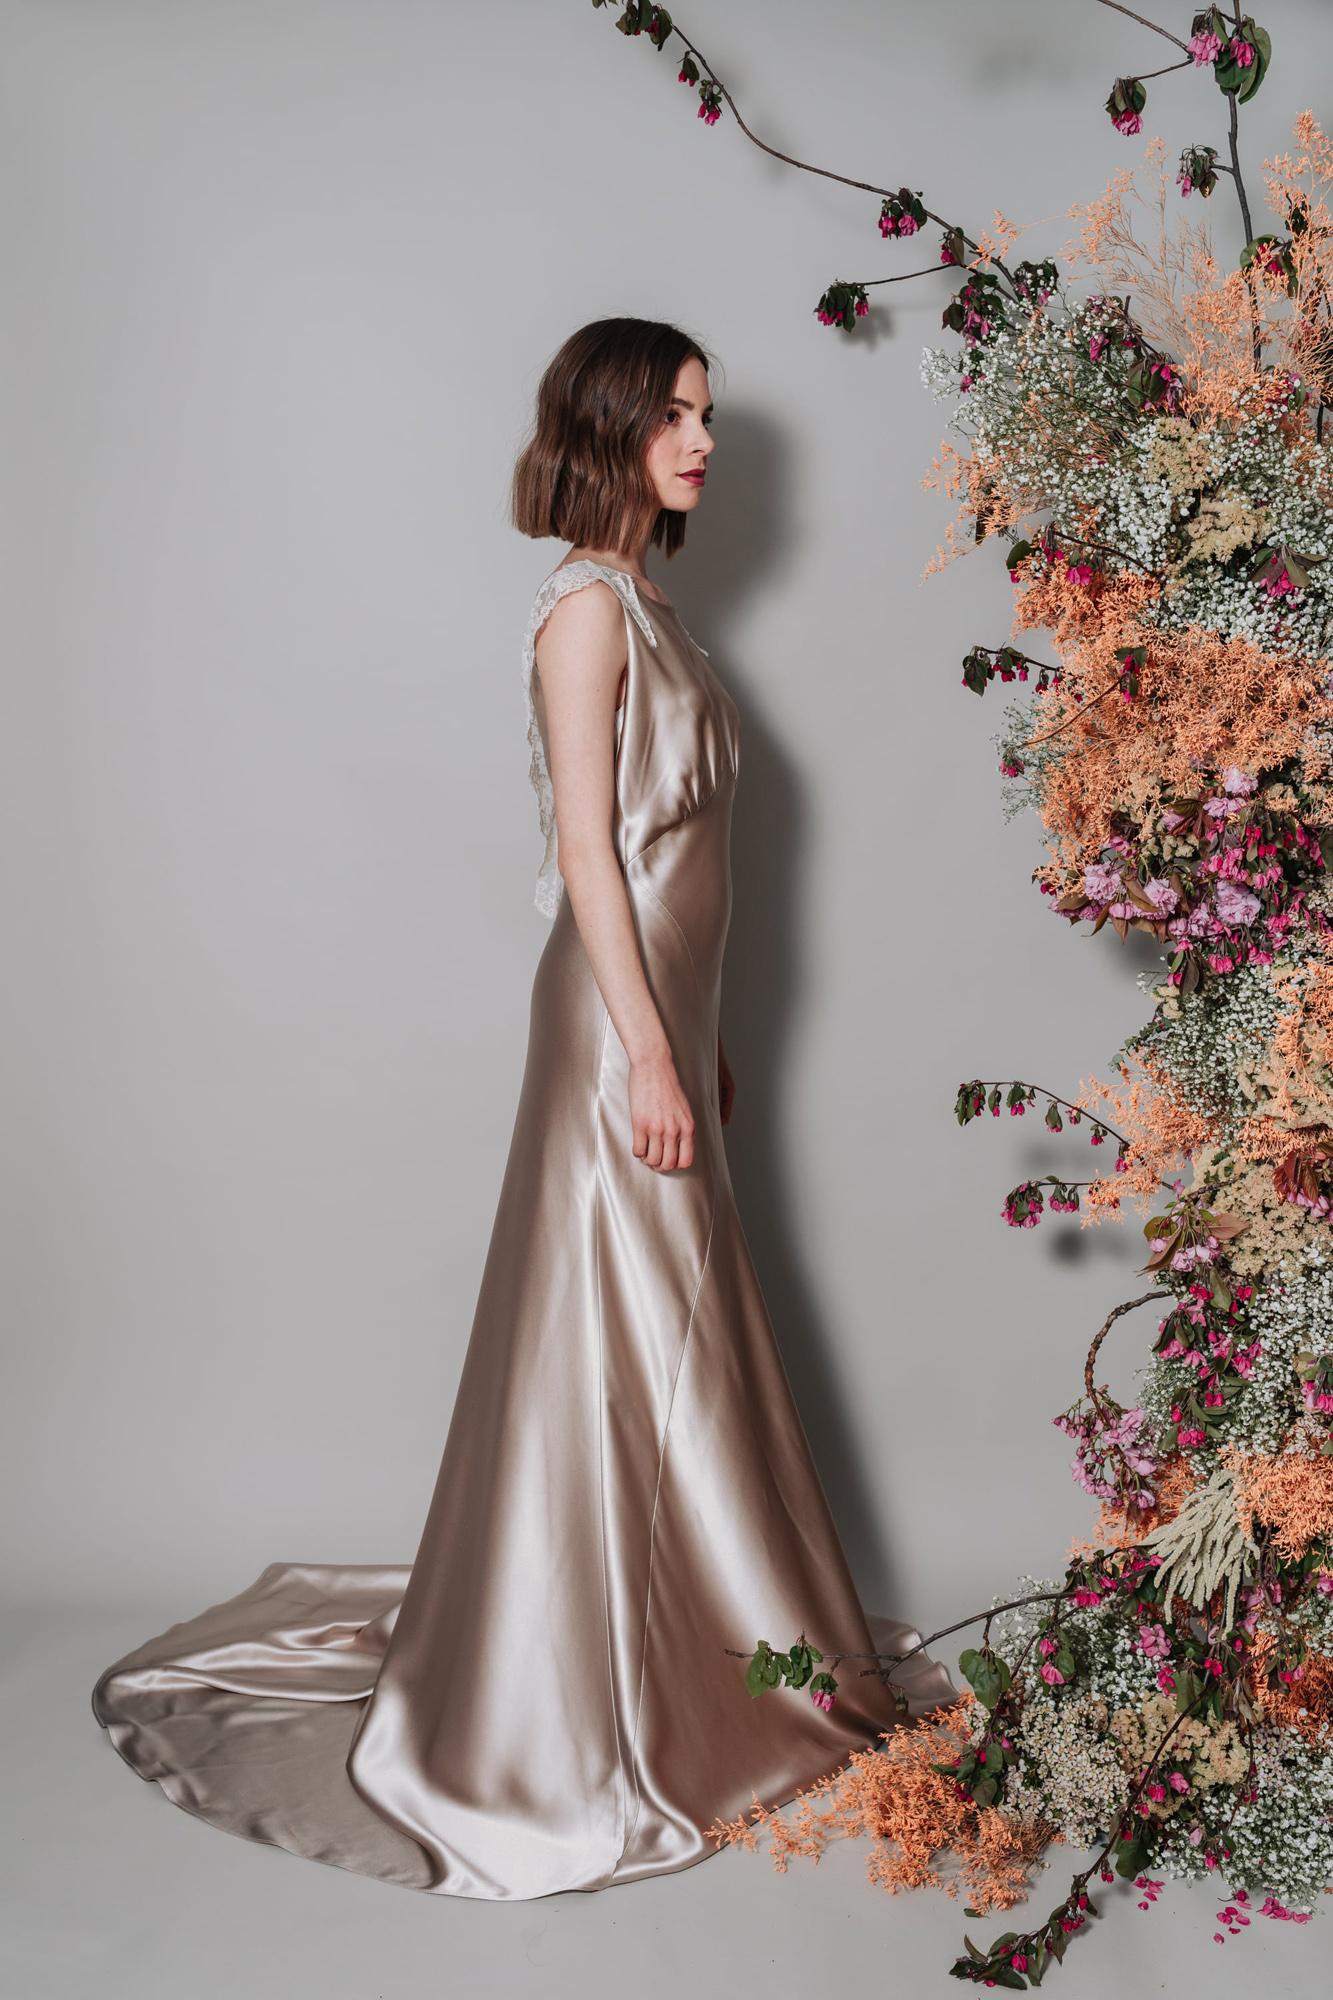 Kate-Beaumont-Sheffield-Honeysuckle-Bias-Cut-Silk-Panelled-Wedding-Gown-11.jpg